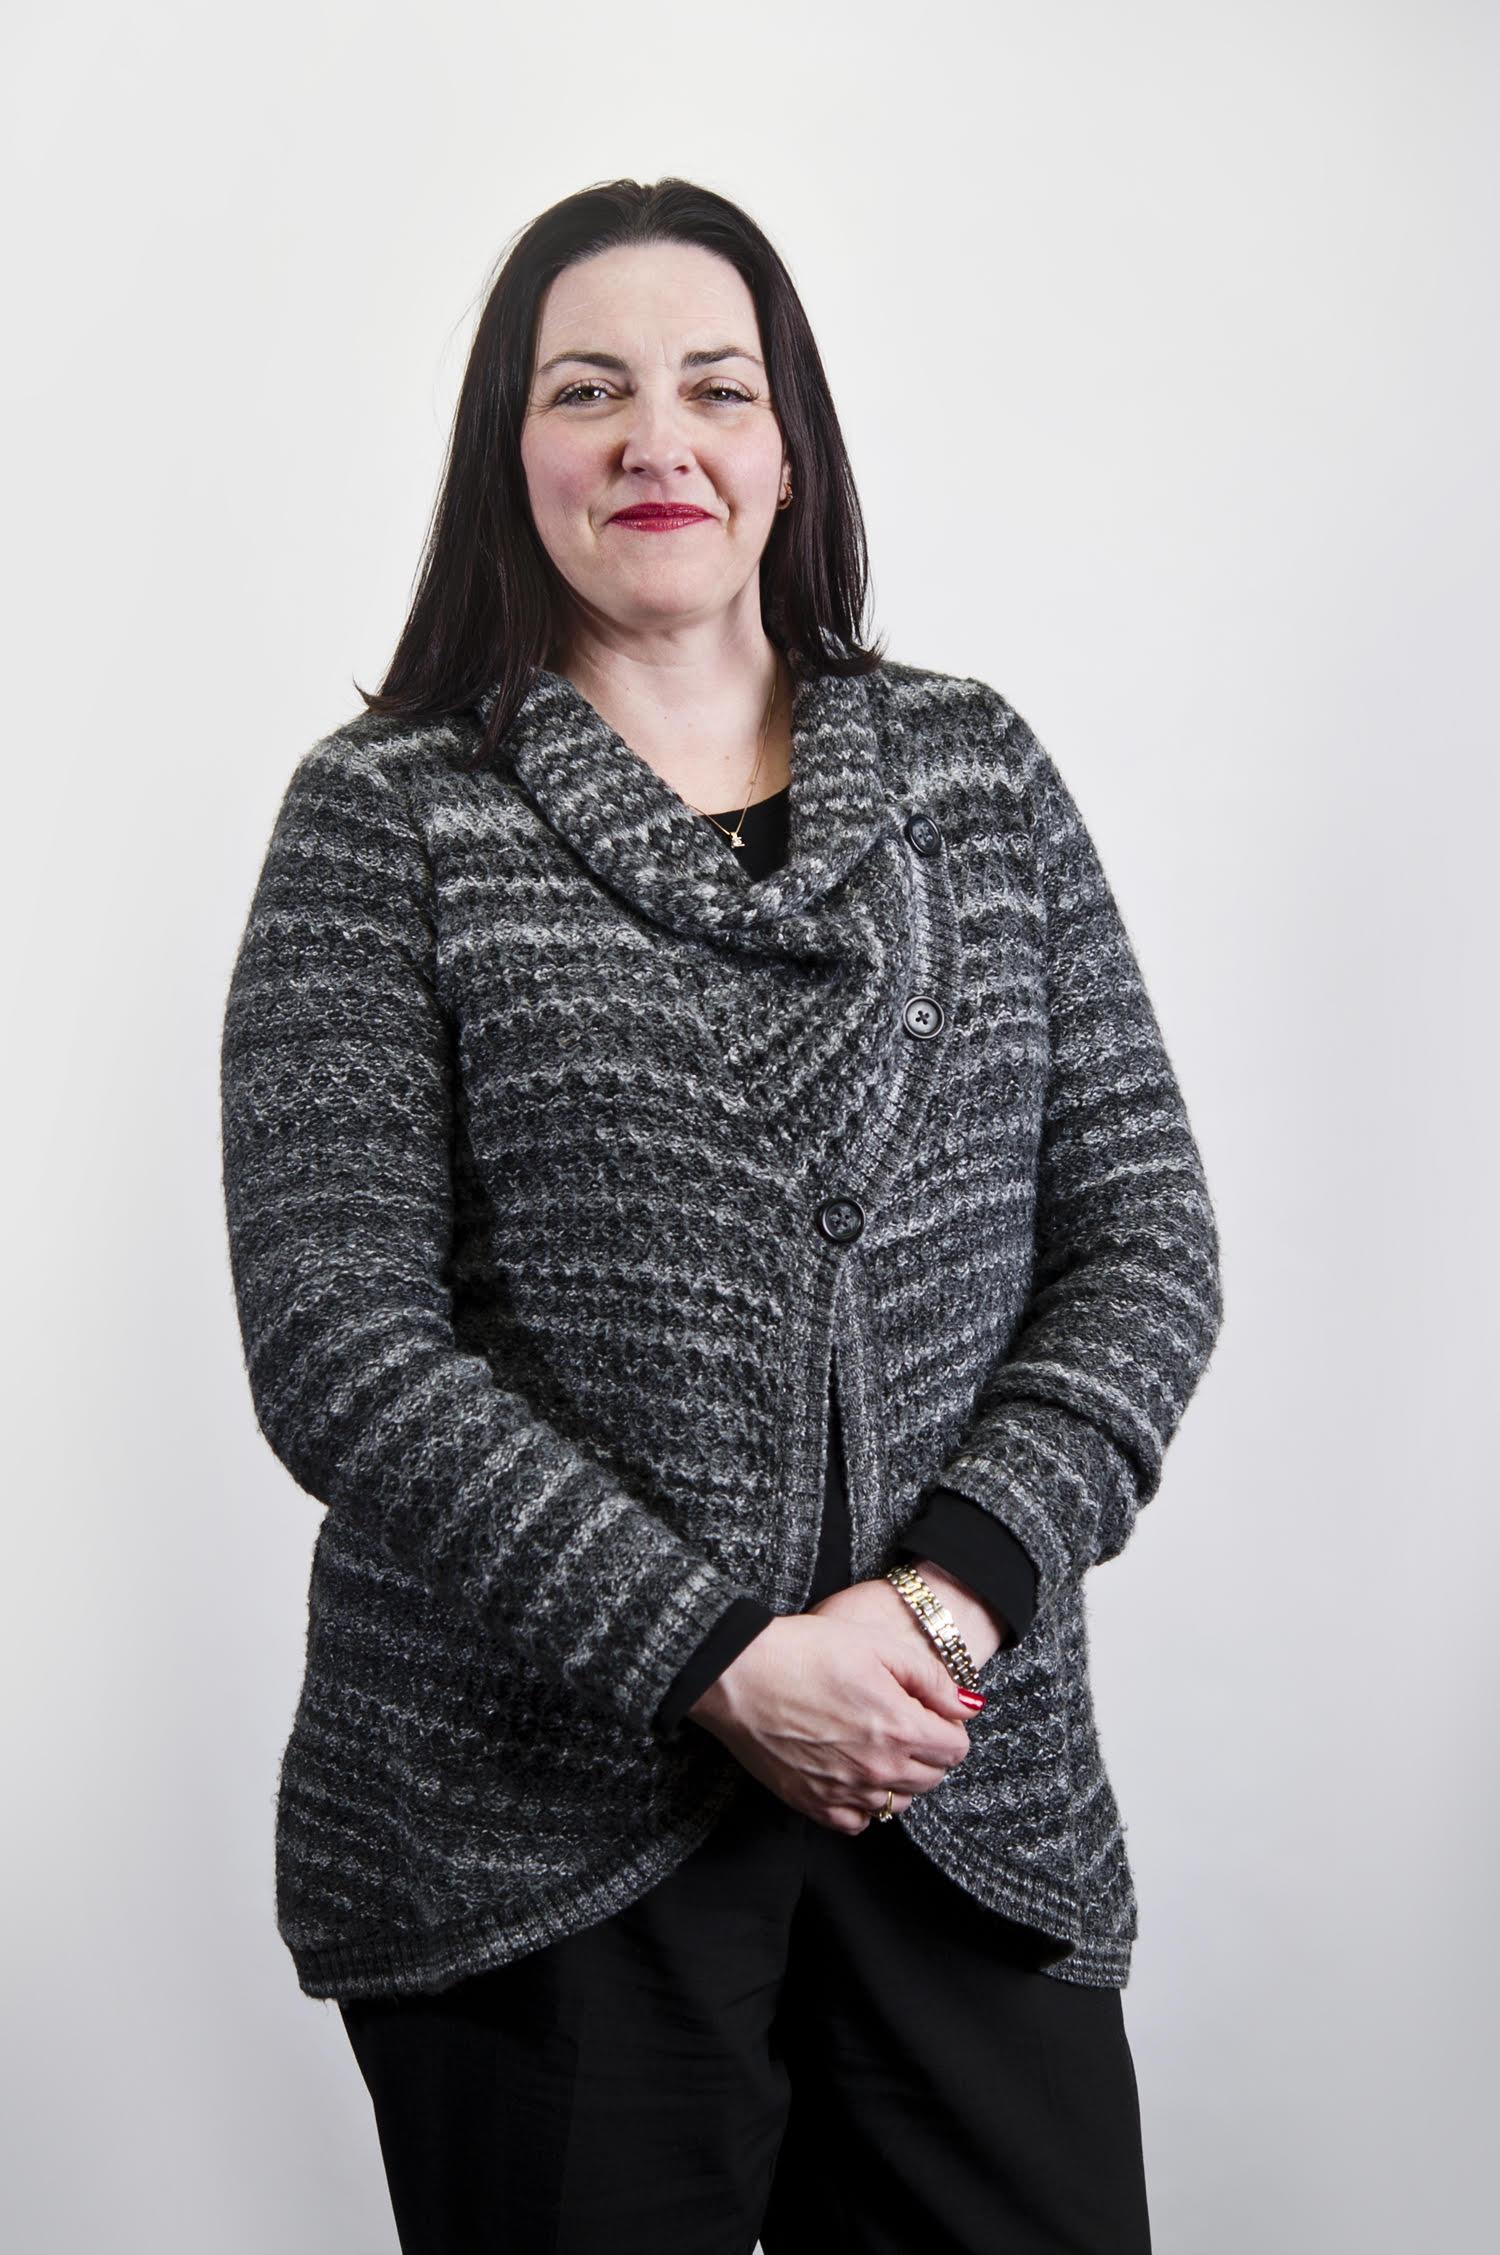 Amy Breznik | General Manager  (403) 317-4555 extension 6  renterschoiceab@gmail.com